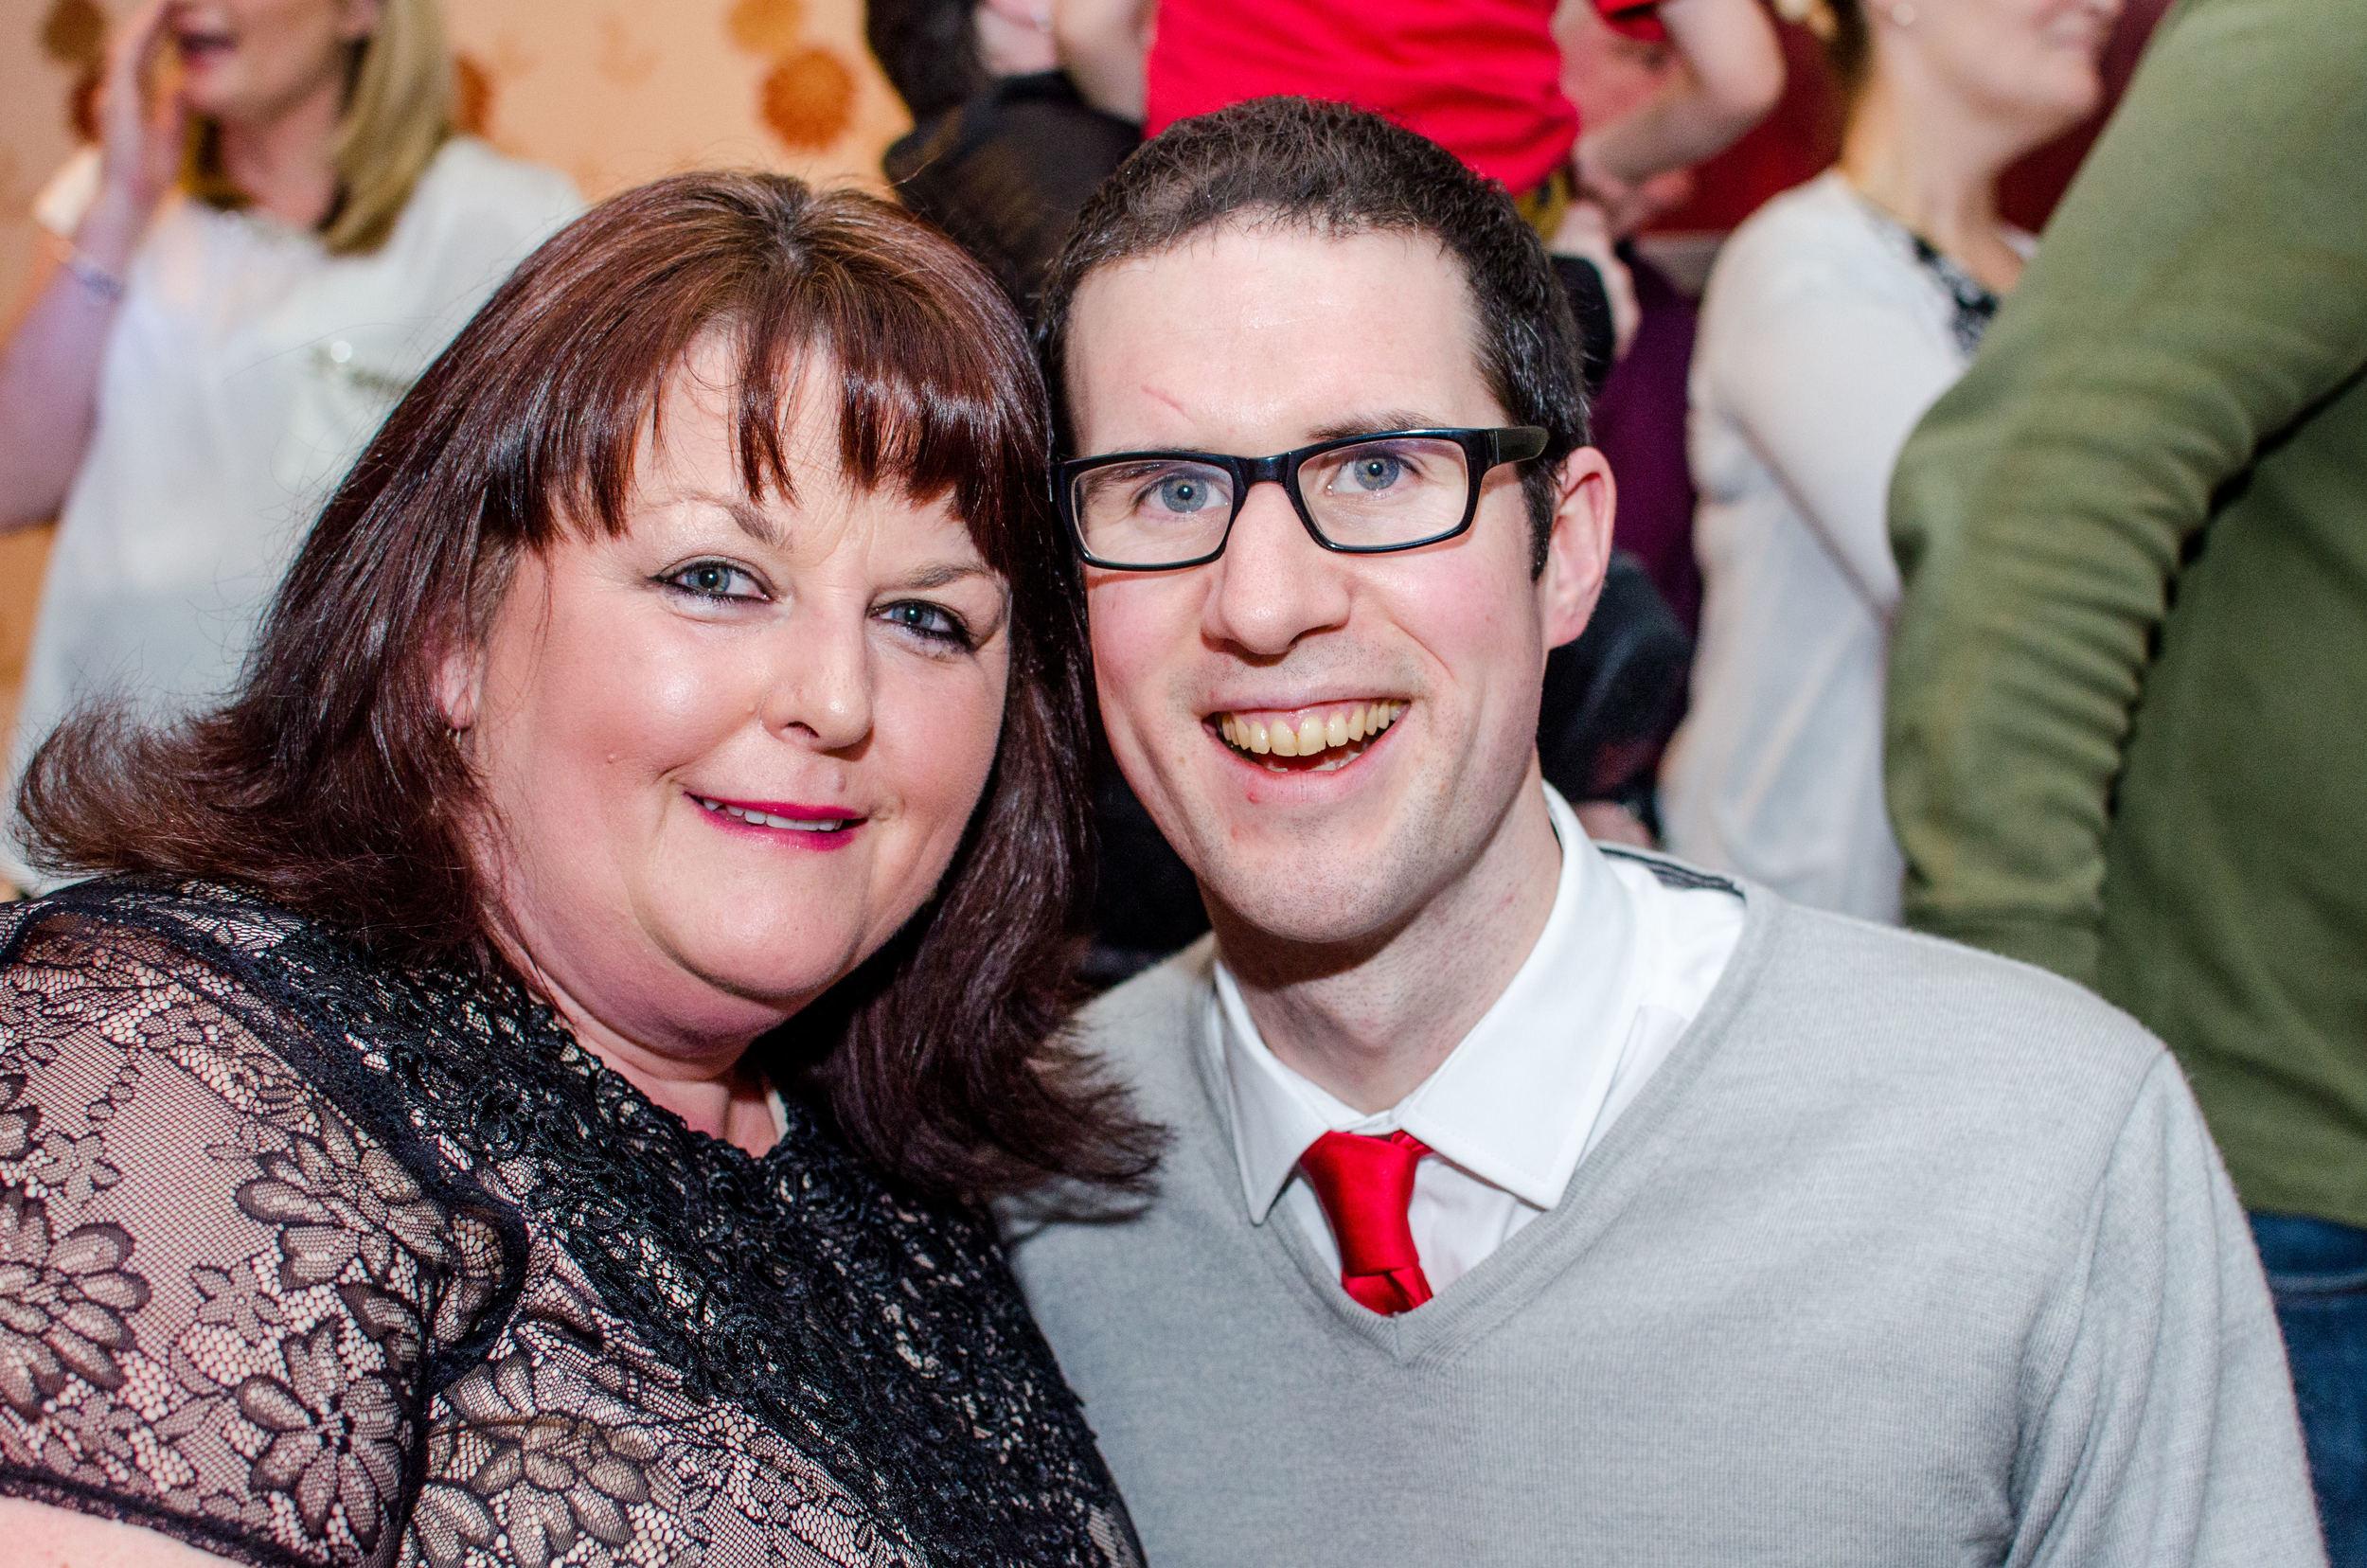 Cath Cunningham from Irish Community Care